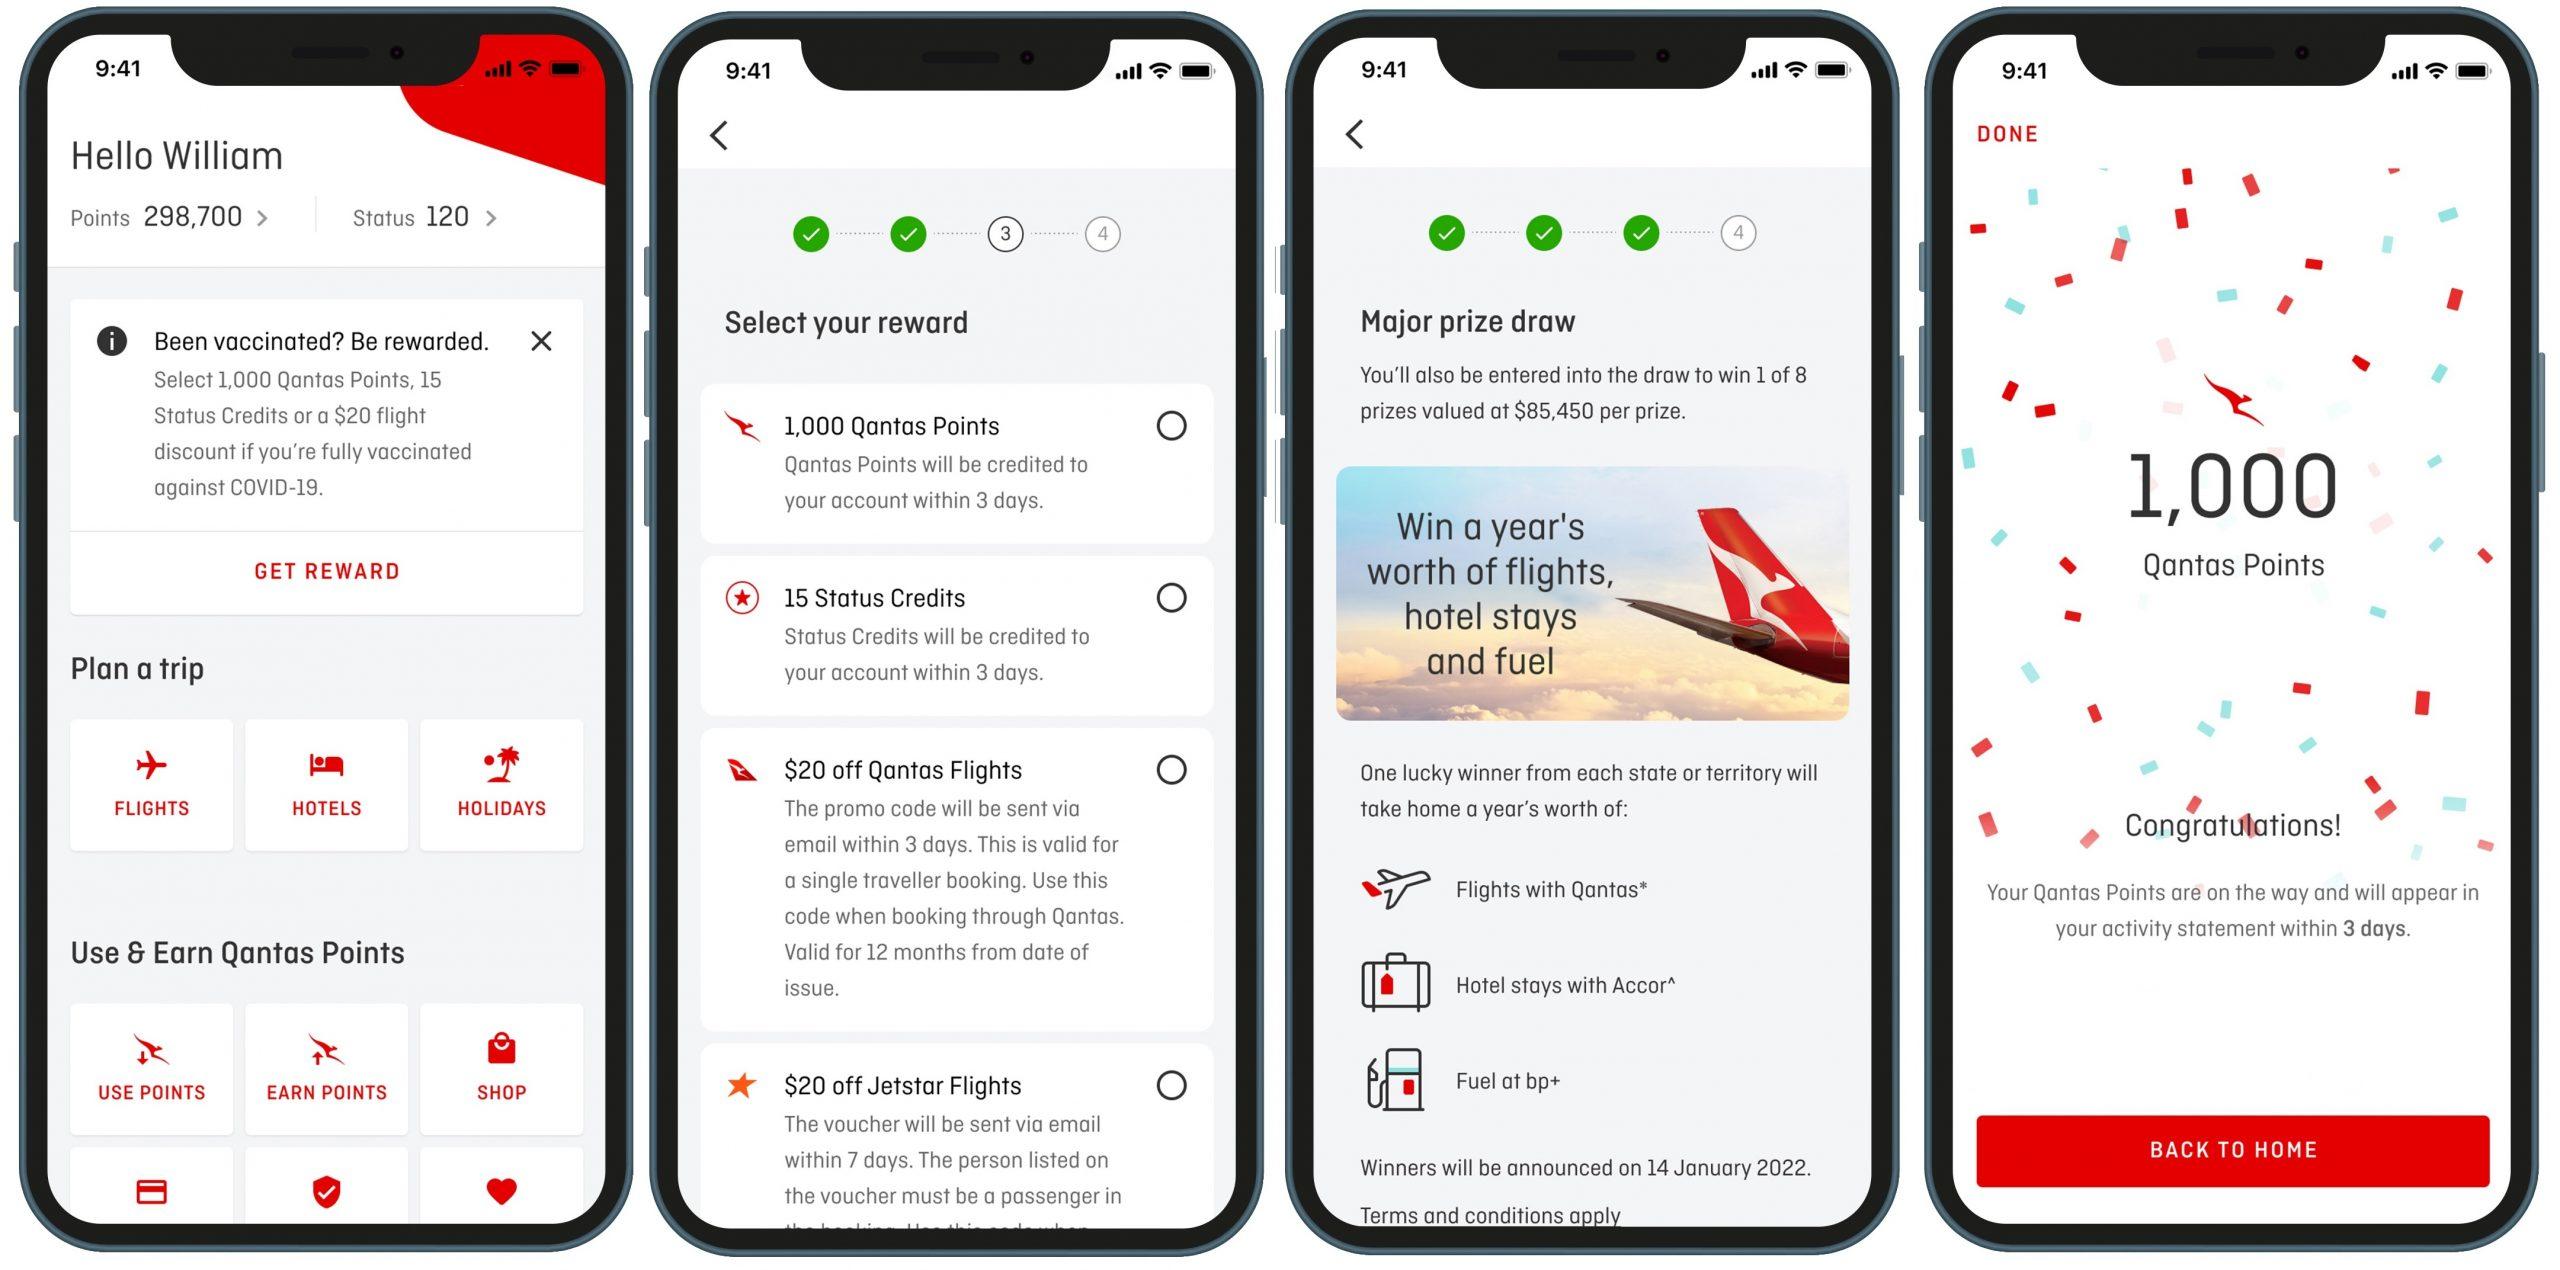 Image is to show the new Qantas reward scheme